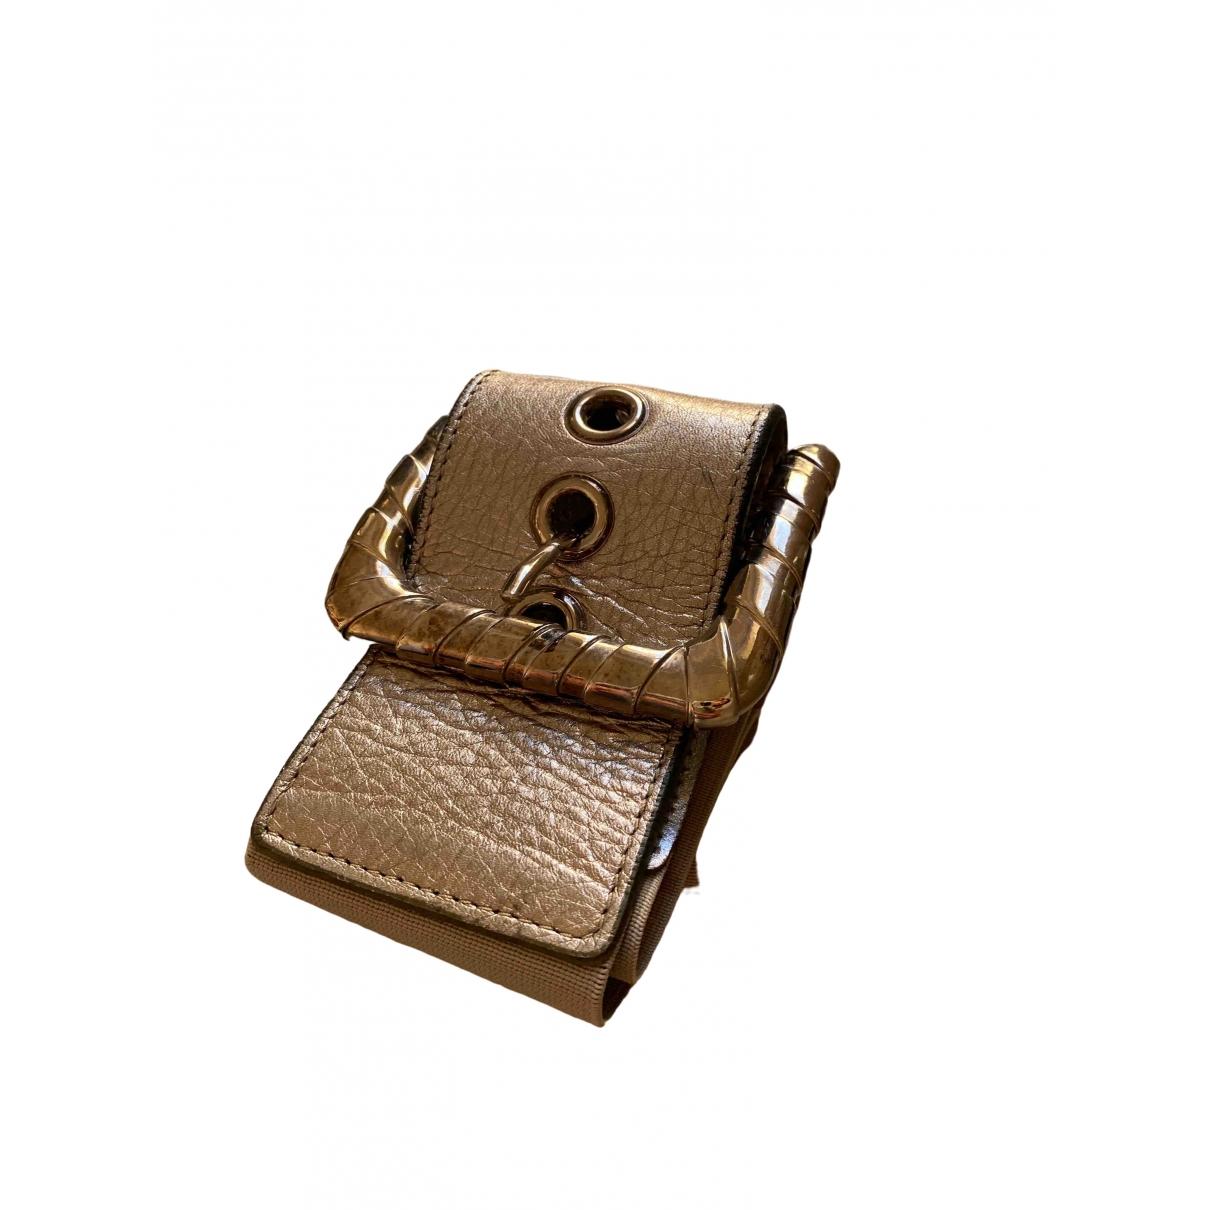 D&g \N Metallic Leather belt for Women 80 cm